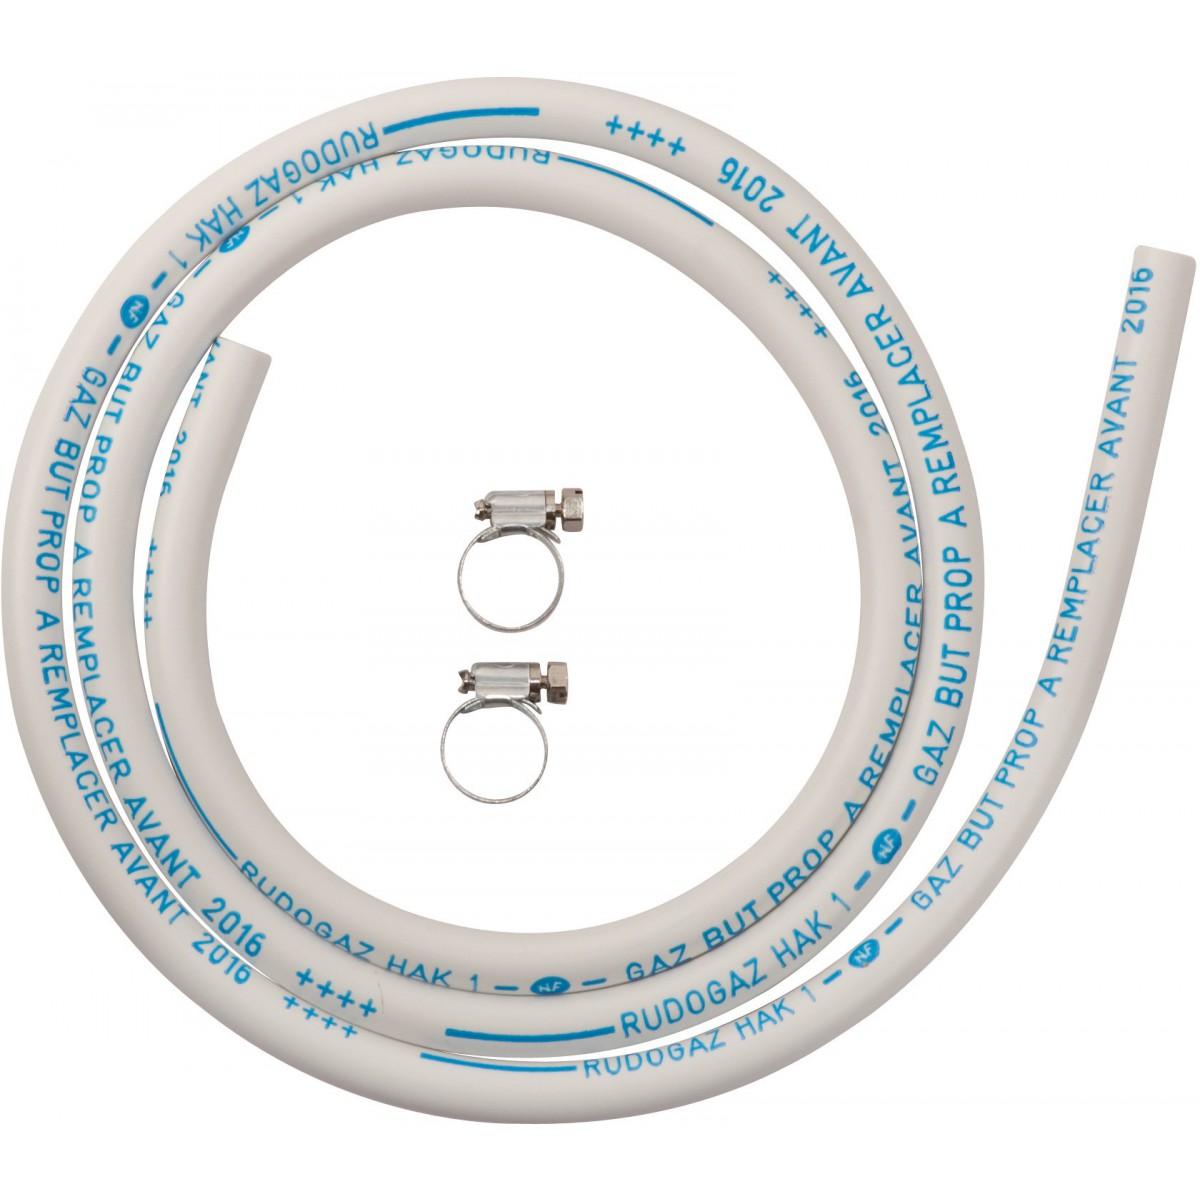 Tube gaz butane / propane Eurogaz - Longueur 1 m